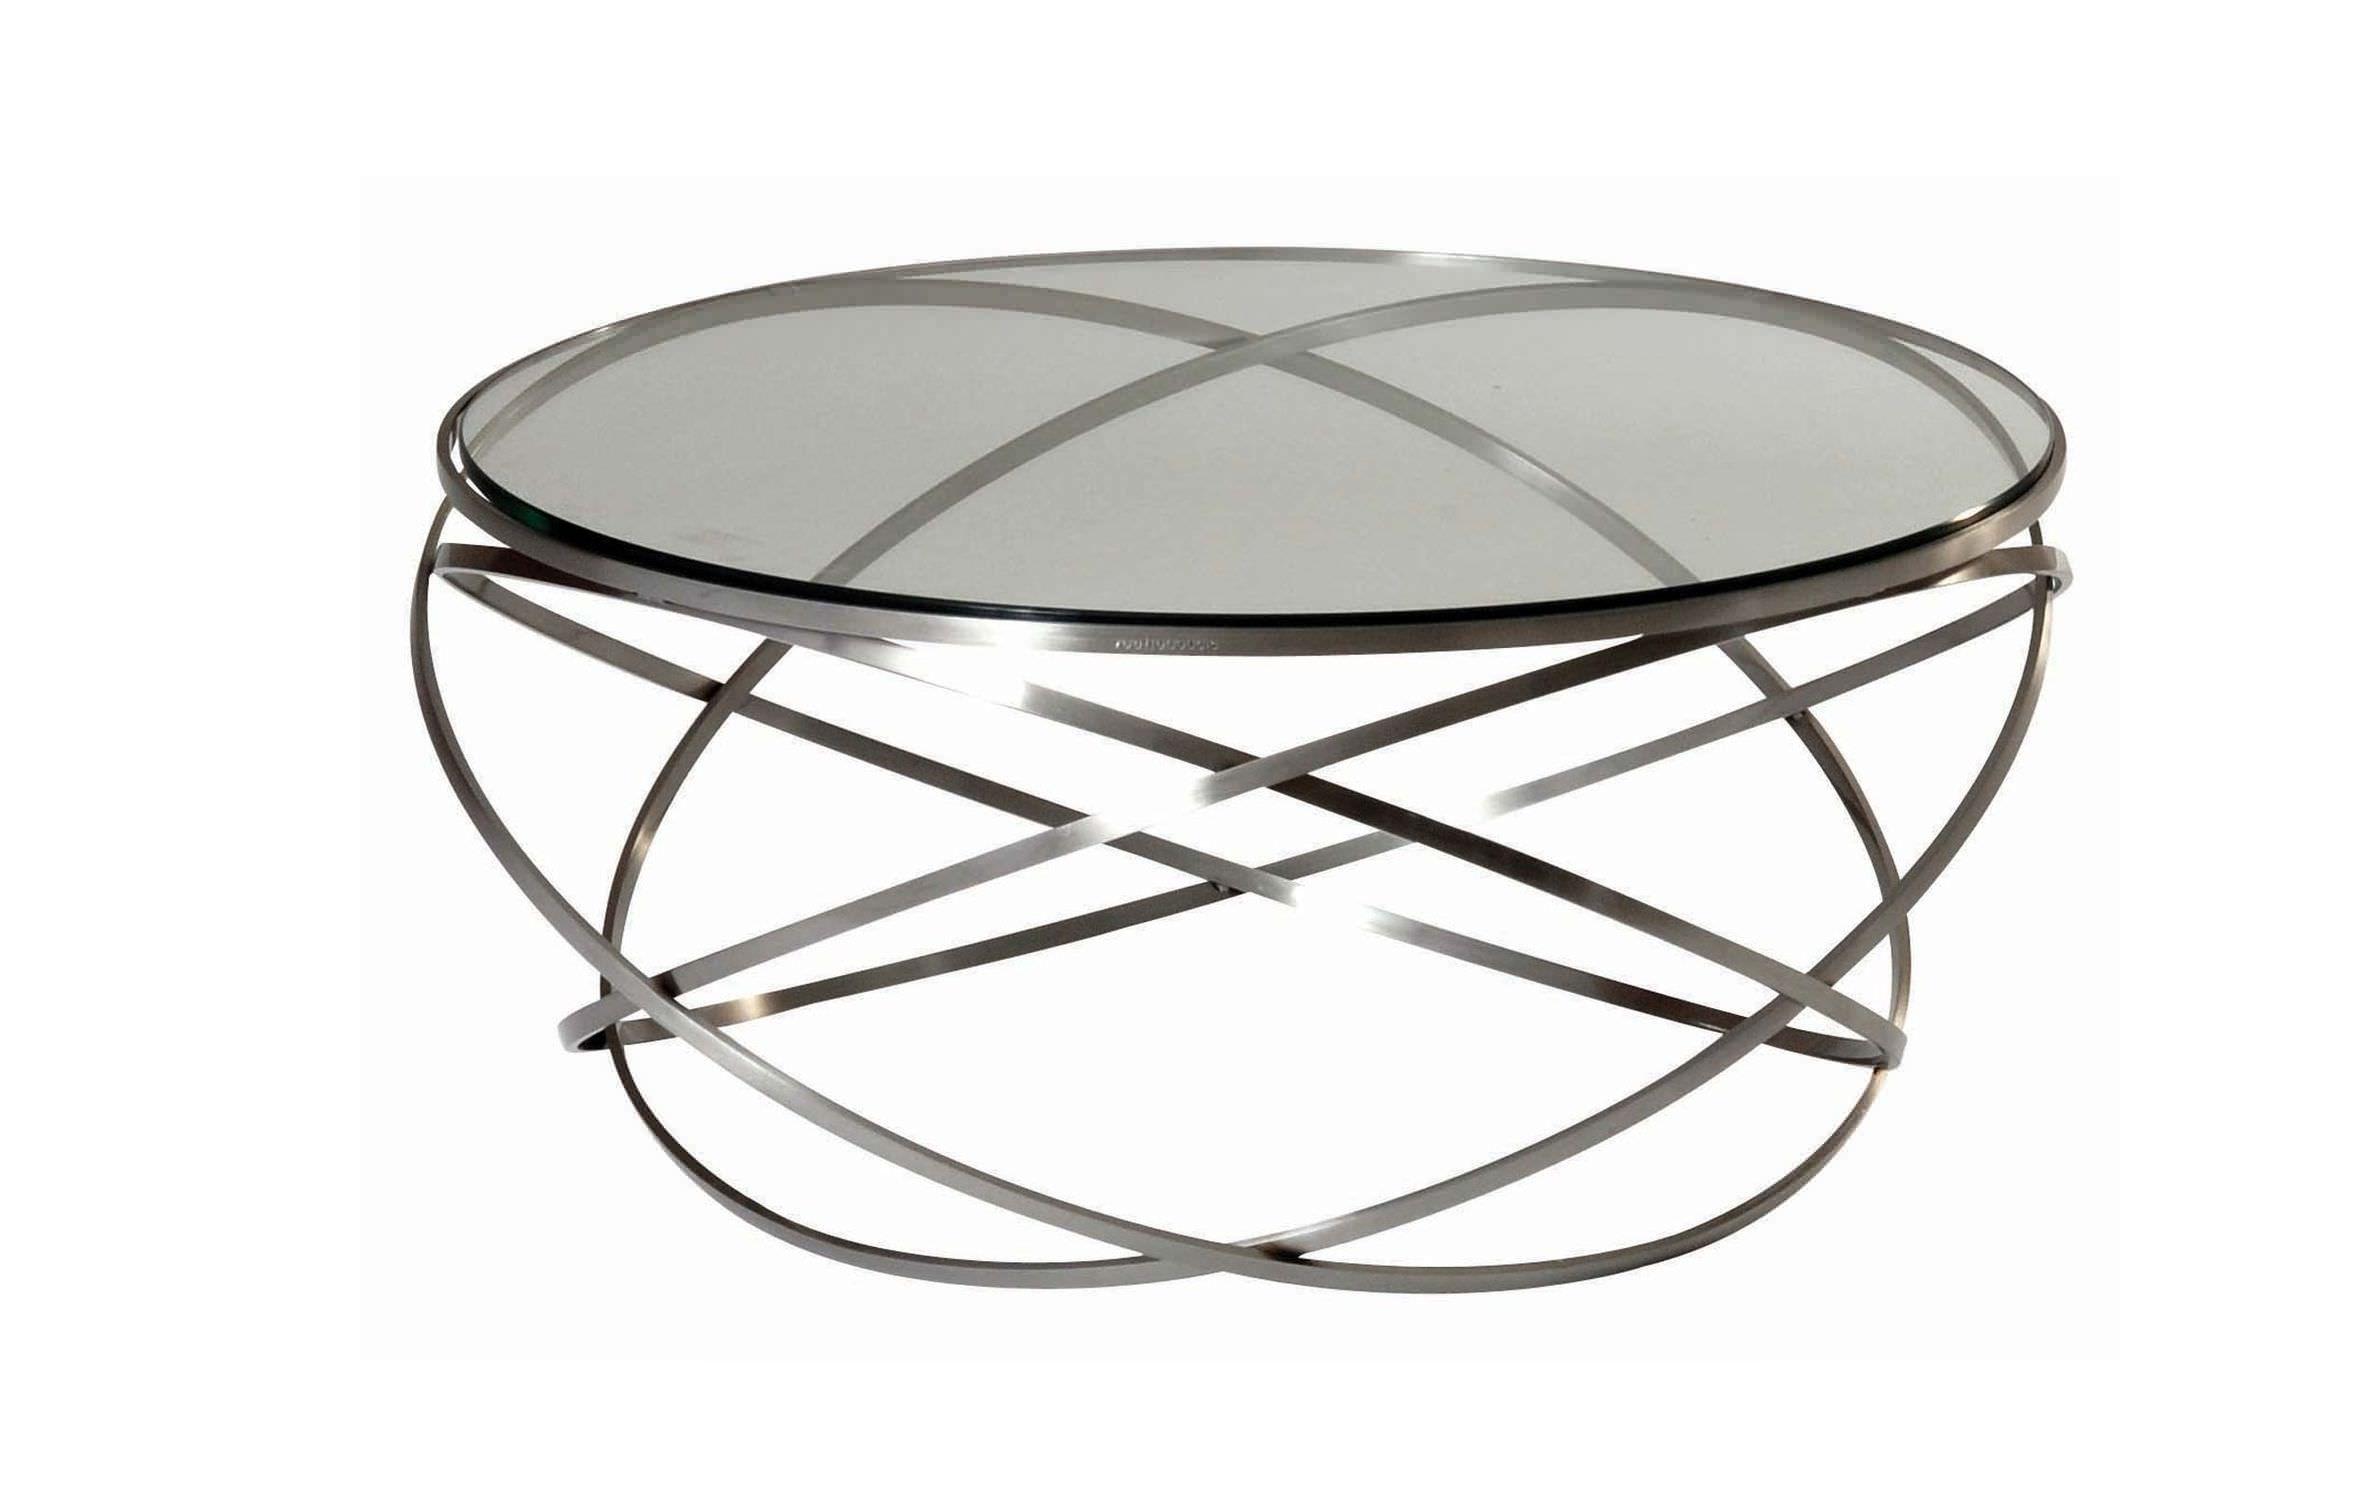 Coffee Table Round Metal And Glass Coffee Table With Shelf Round Black Metal Coffee Table Met Glass Coffee Table Glass Coffee Tables Living Room Coffee Table [ jpg ]